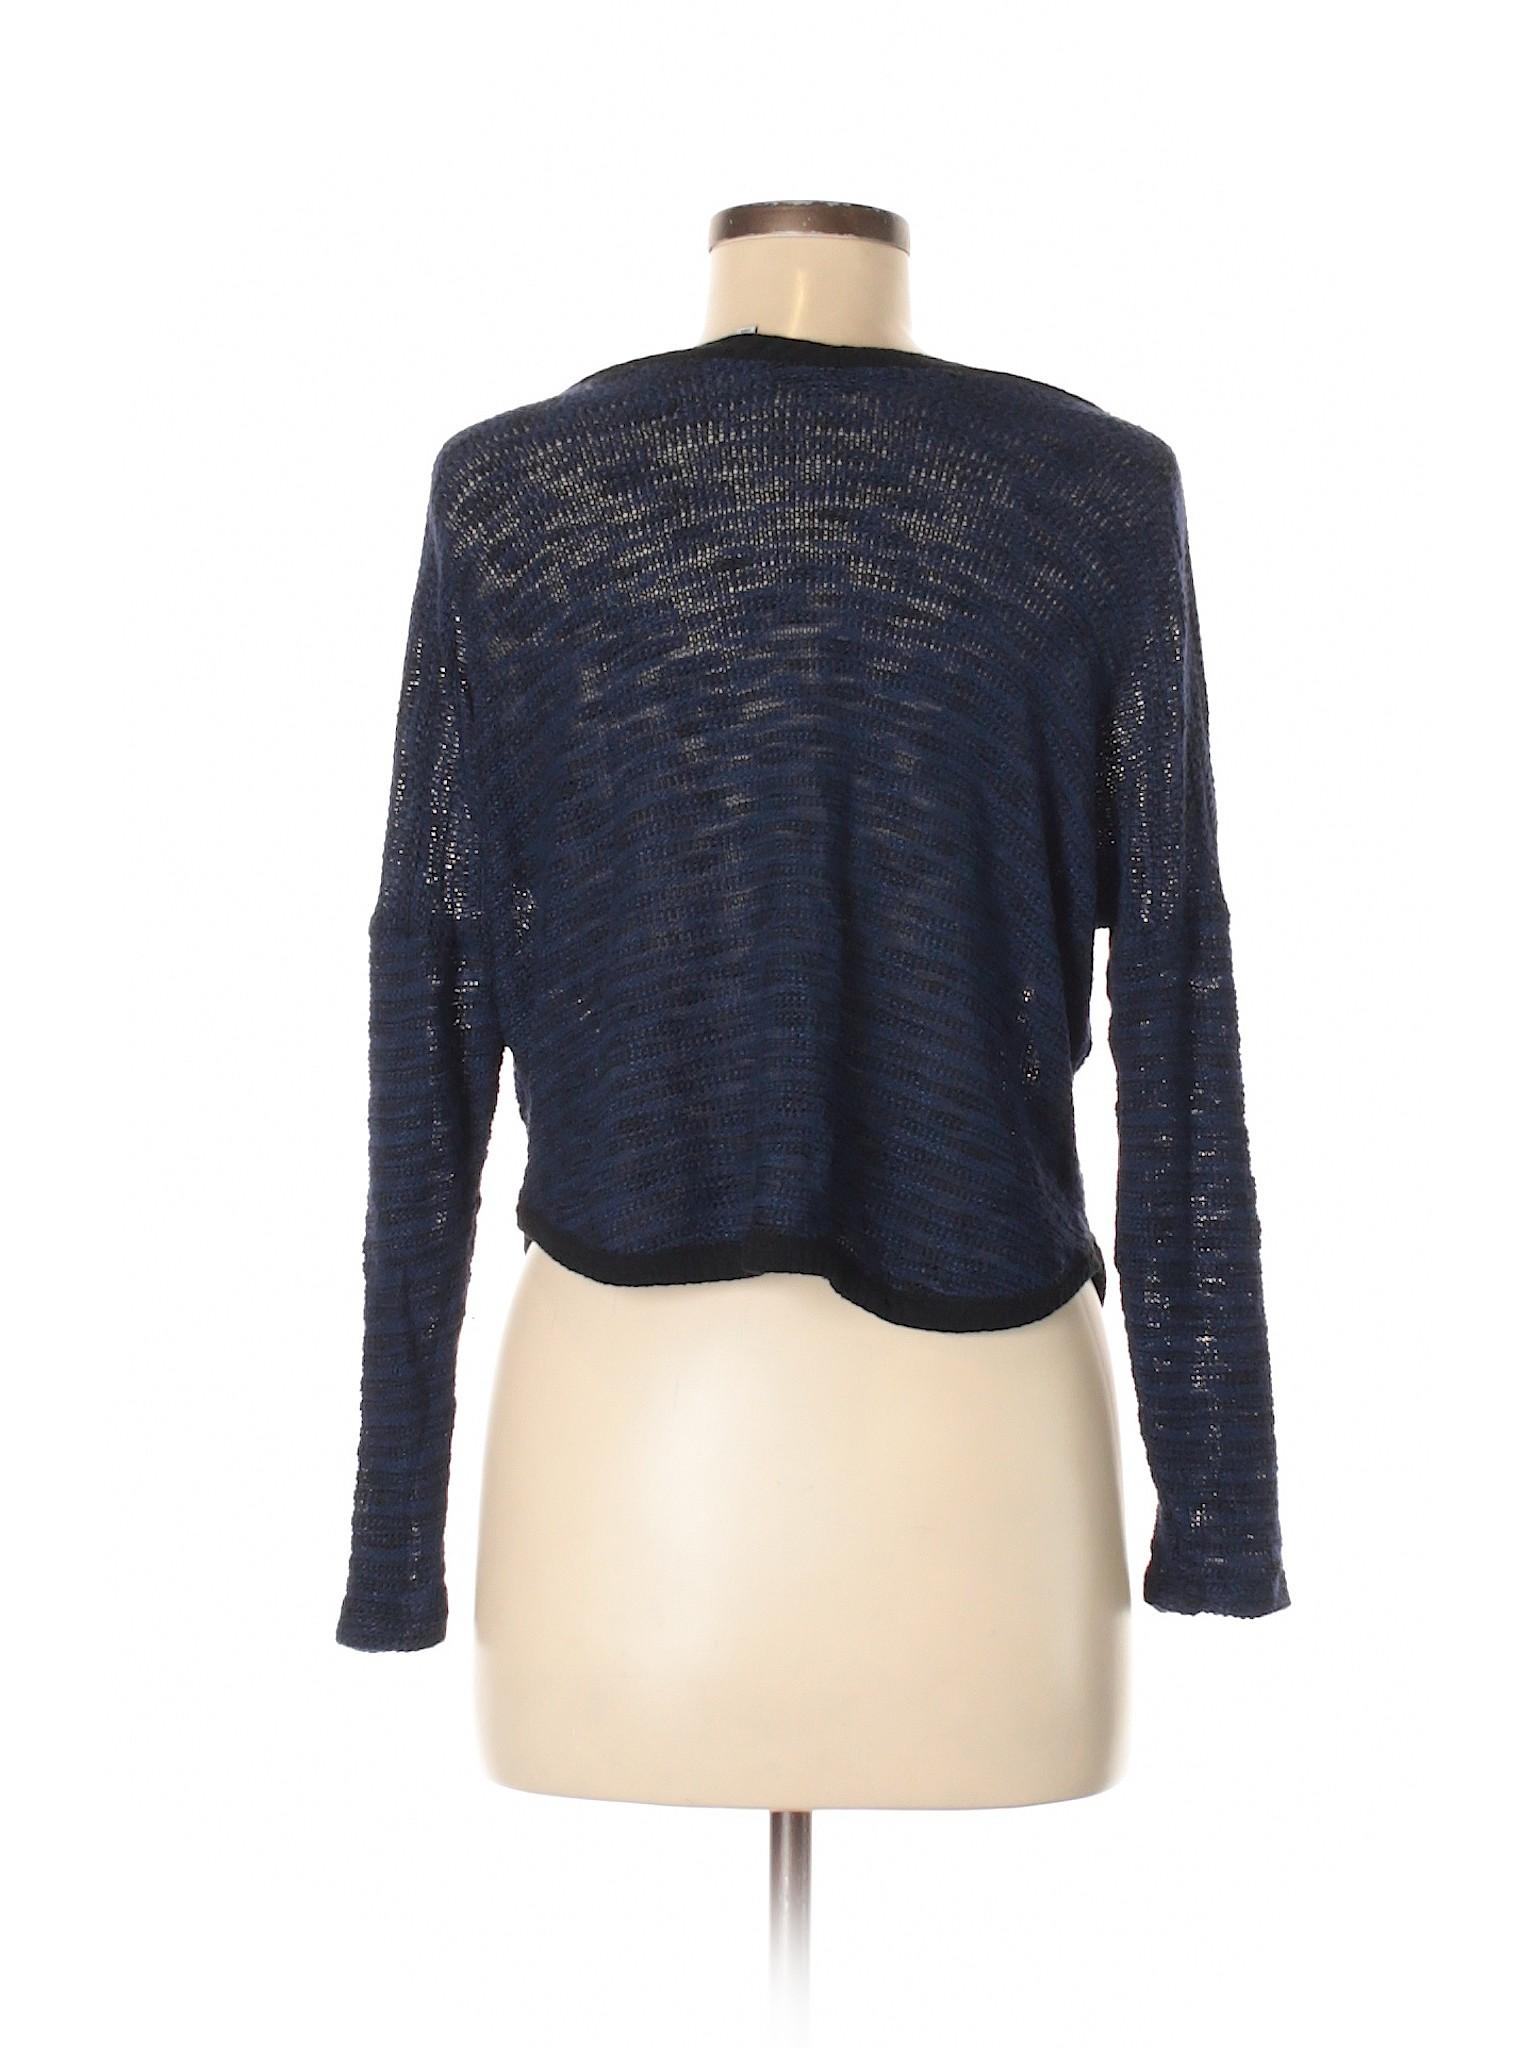 Splendid Sweater Boutique Pullover Boutique Splendid Rvz1OFqYRW